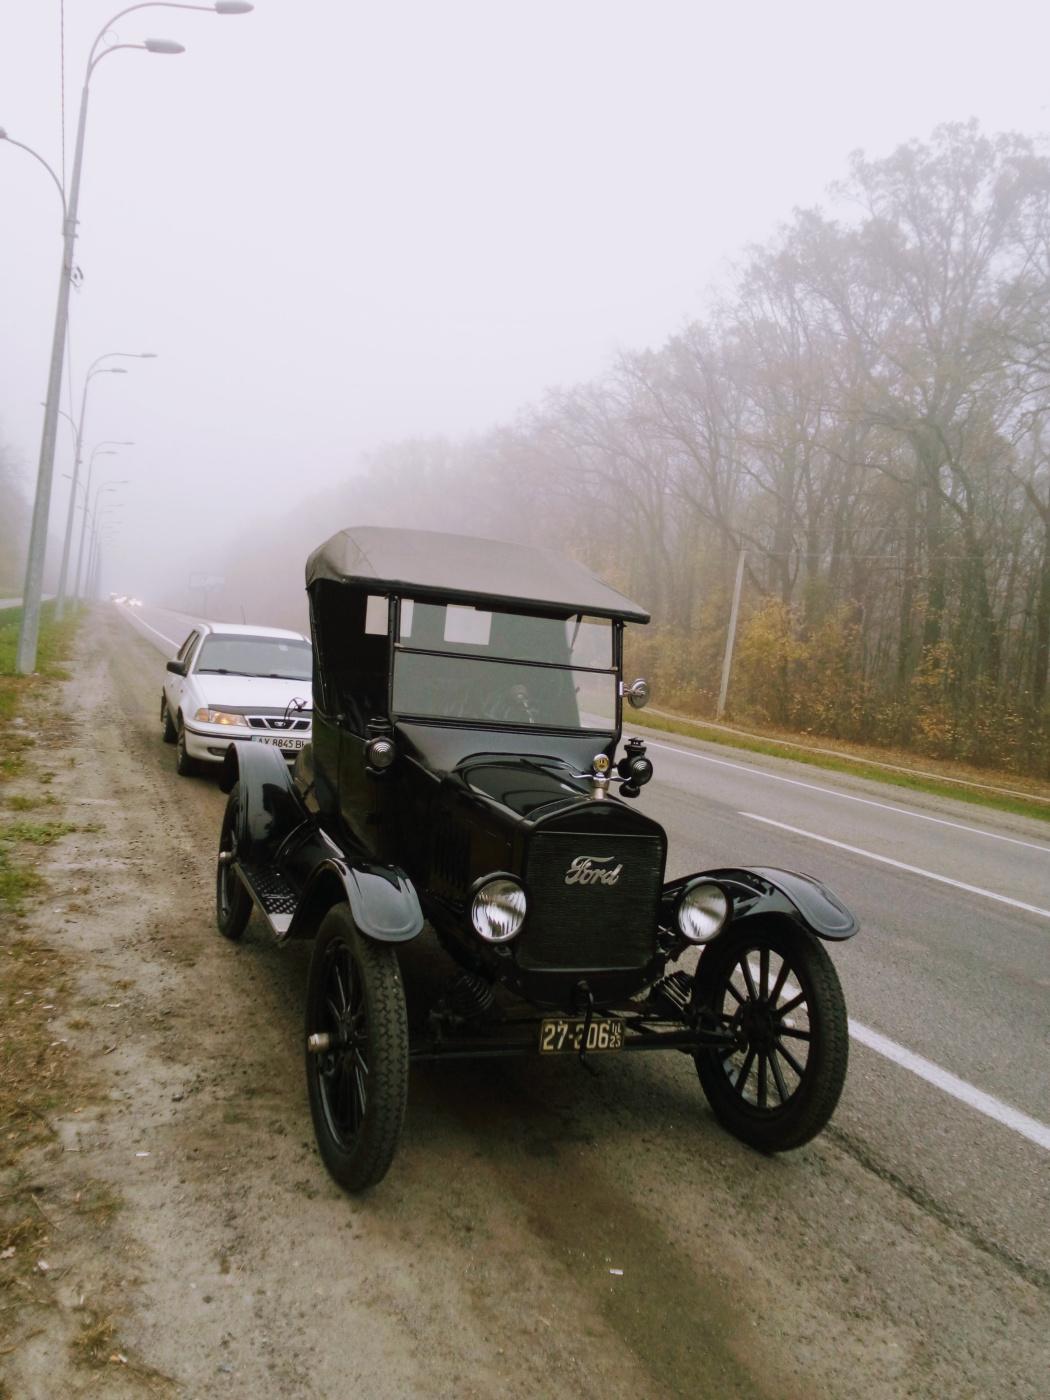 "Алексей Гришанков (Alegri). ""Ford-T"" (1923) in the autumn fog """